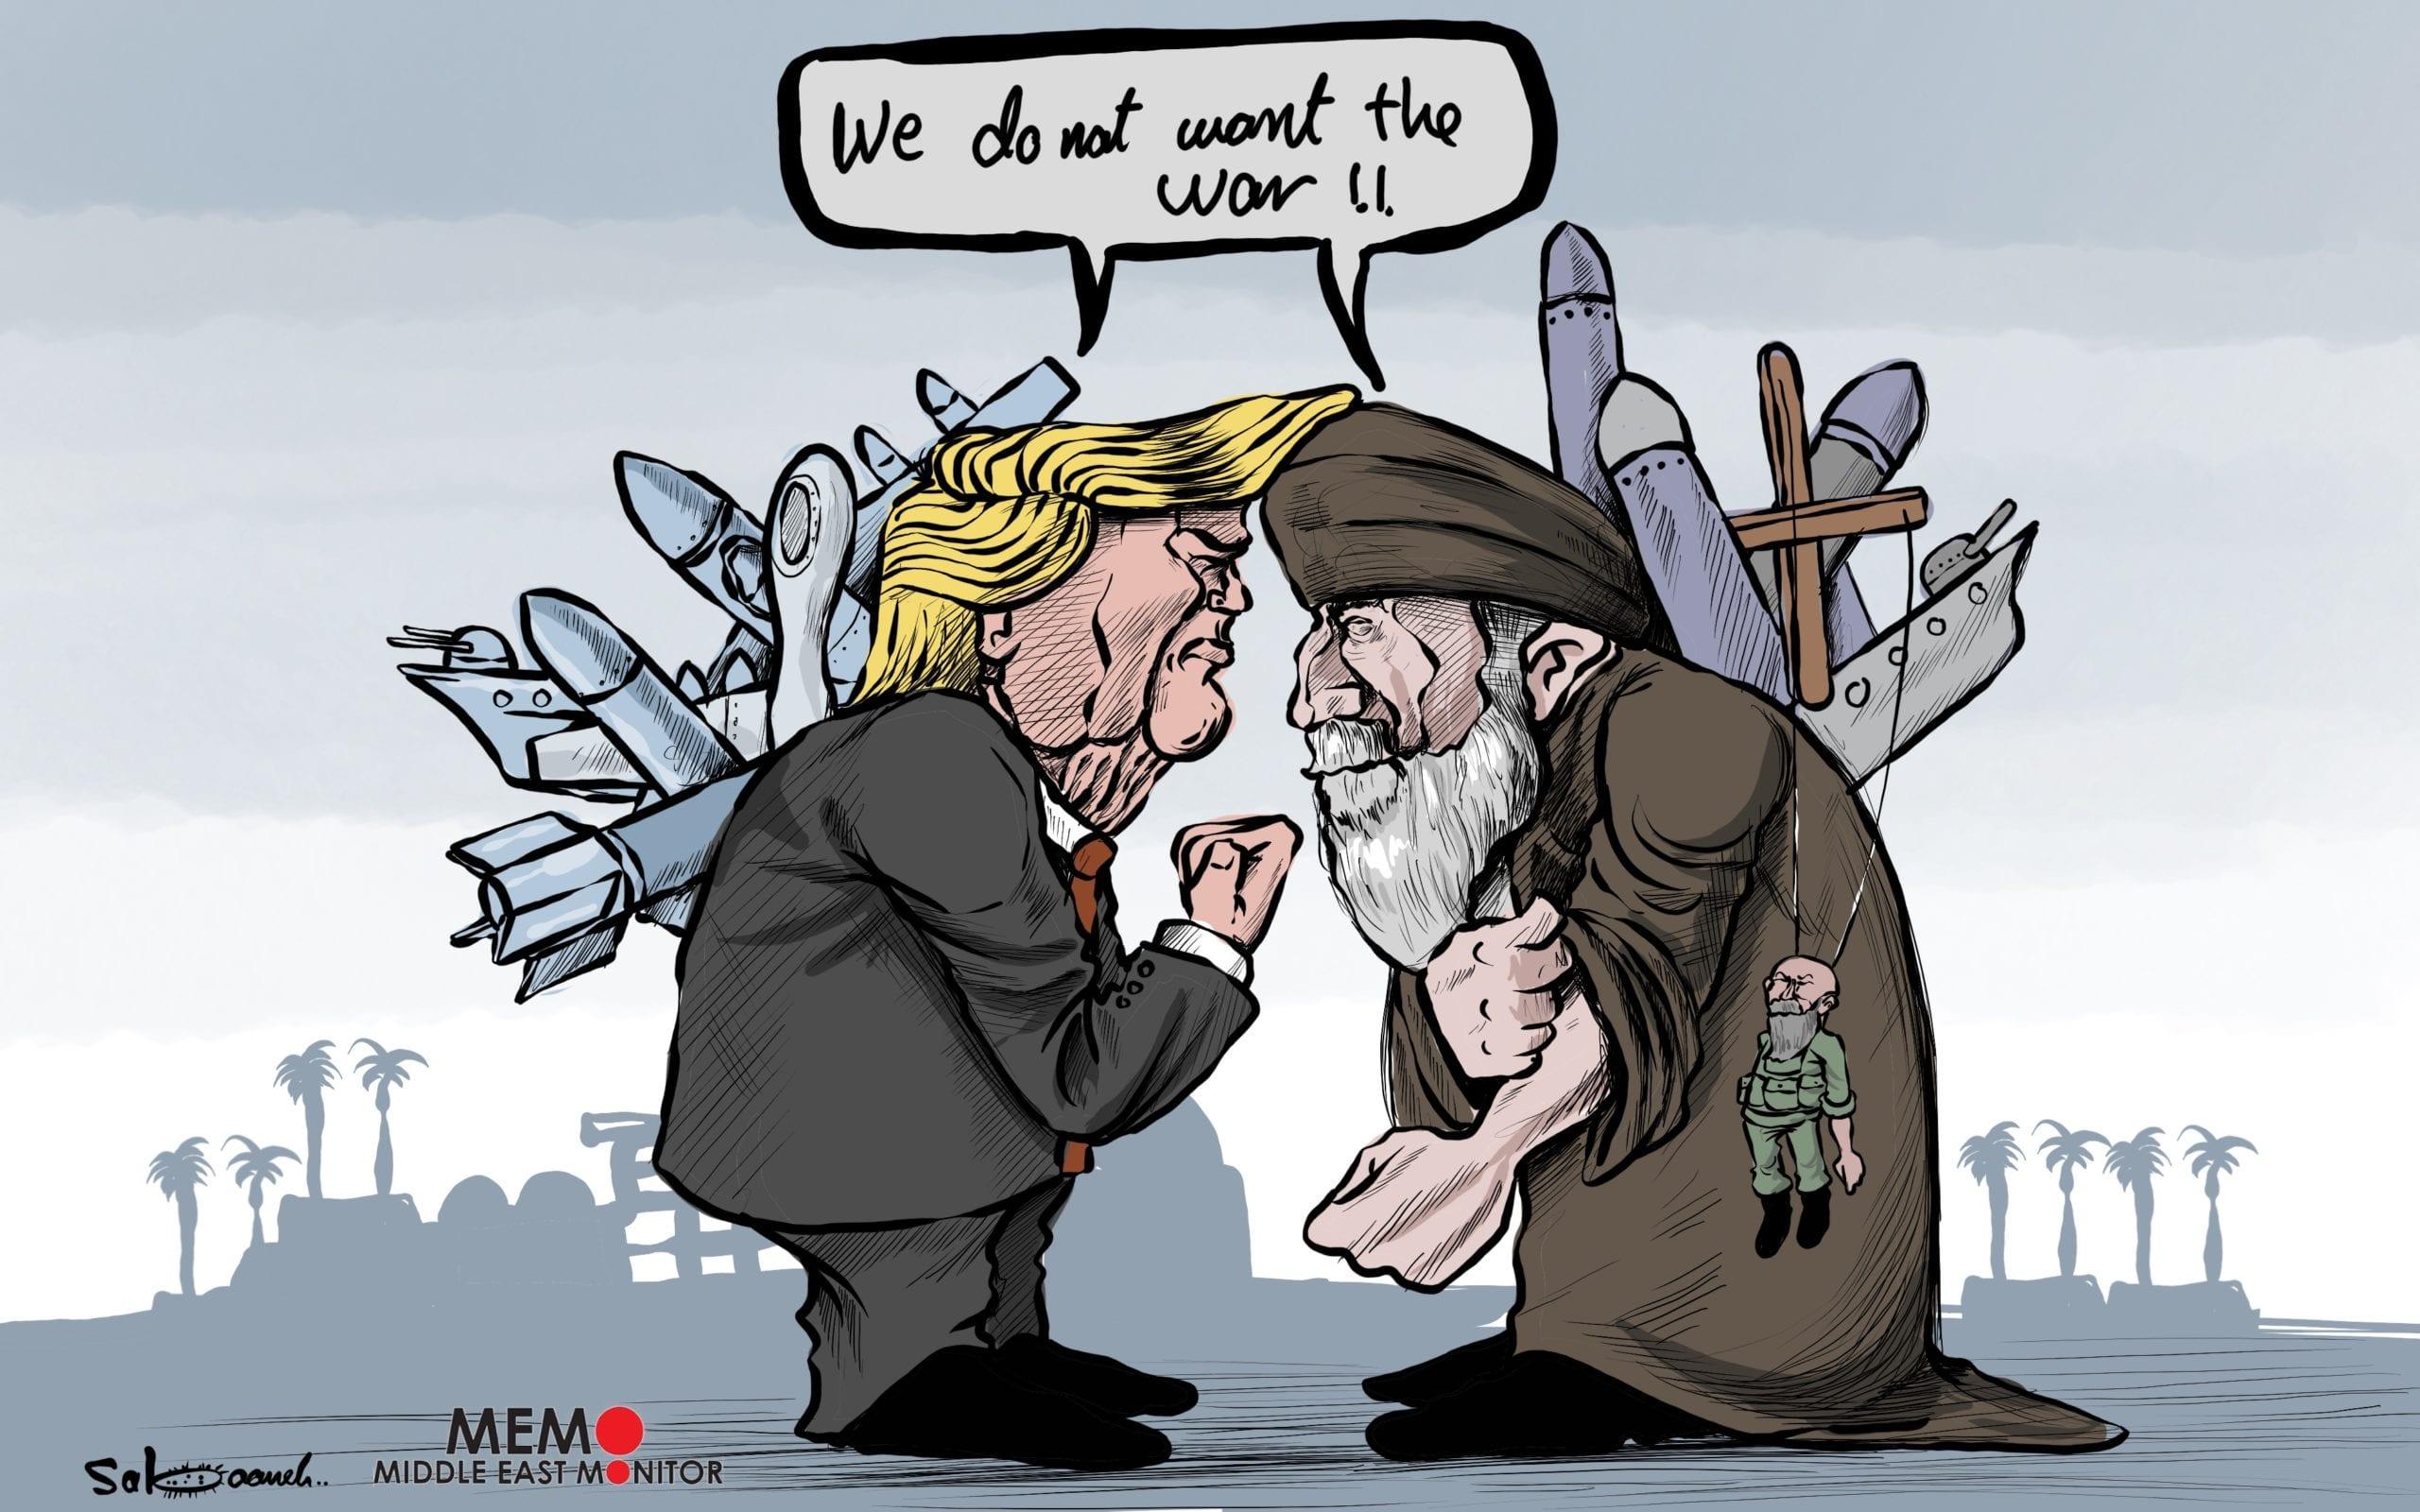 Will the assassination of Qassem Soleimani lead to war